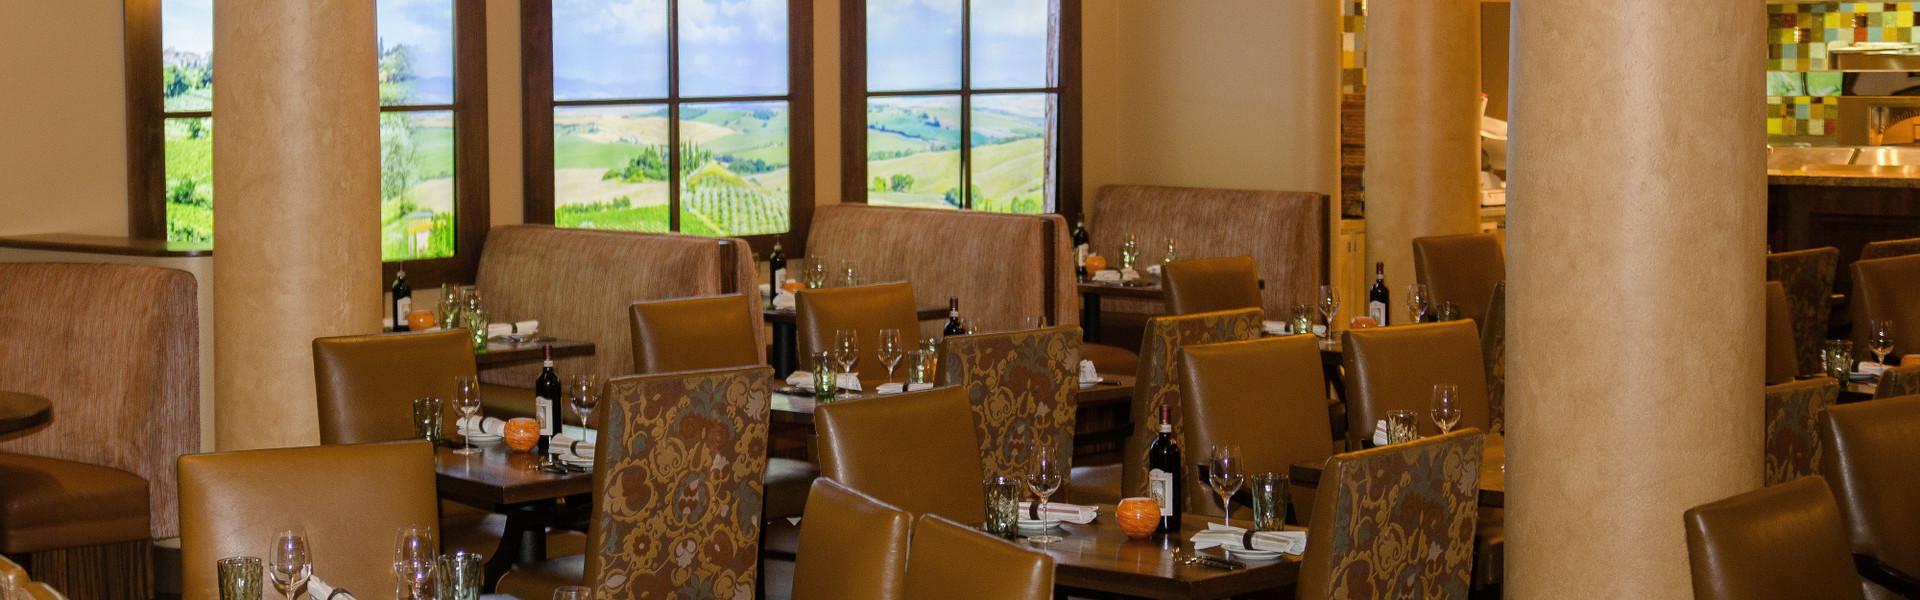 Italian Restaurant at our Las Vegas Hotel and Casino | Fresco Italiano